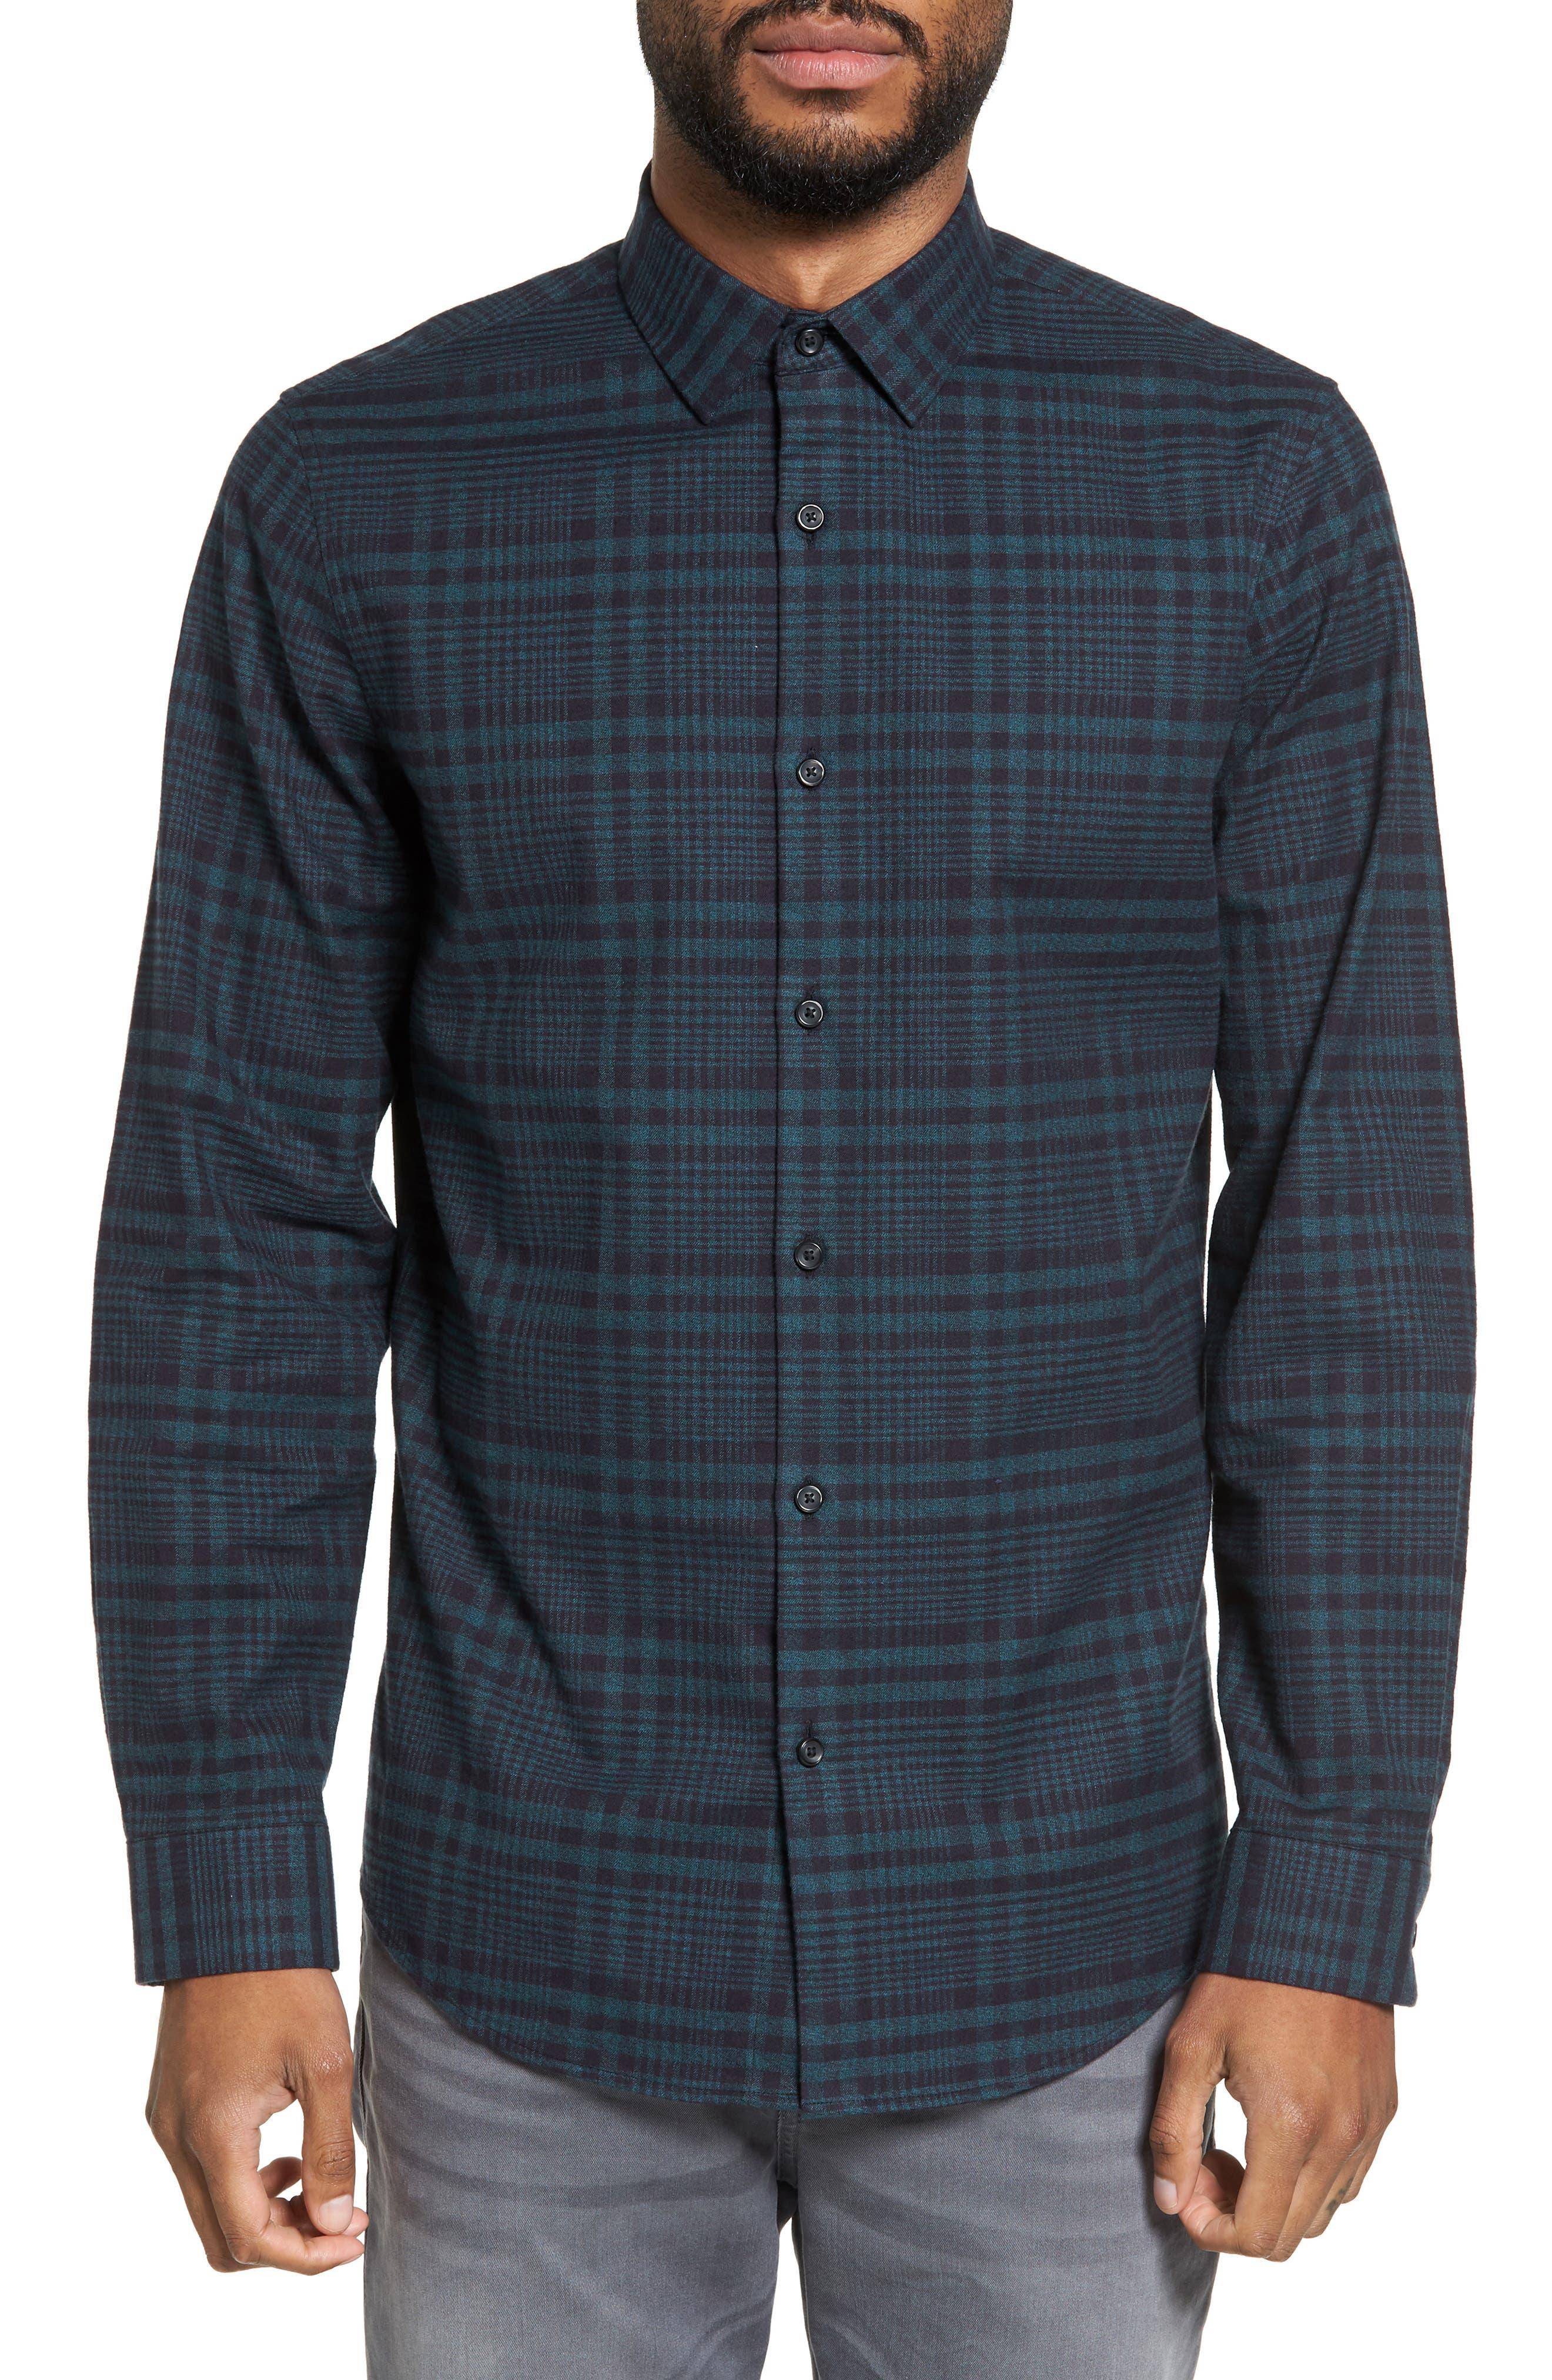 Main Image - Calibrate Plaid Flannel Sport Shirt